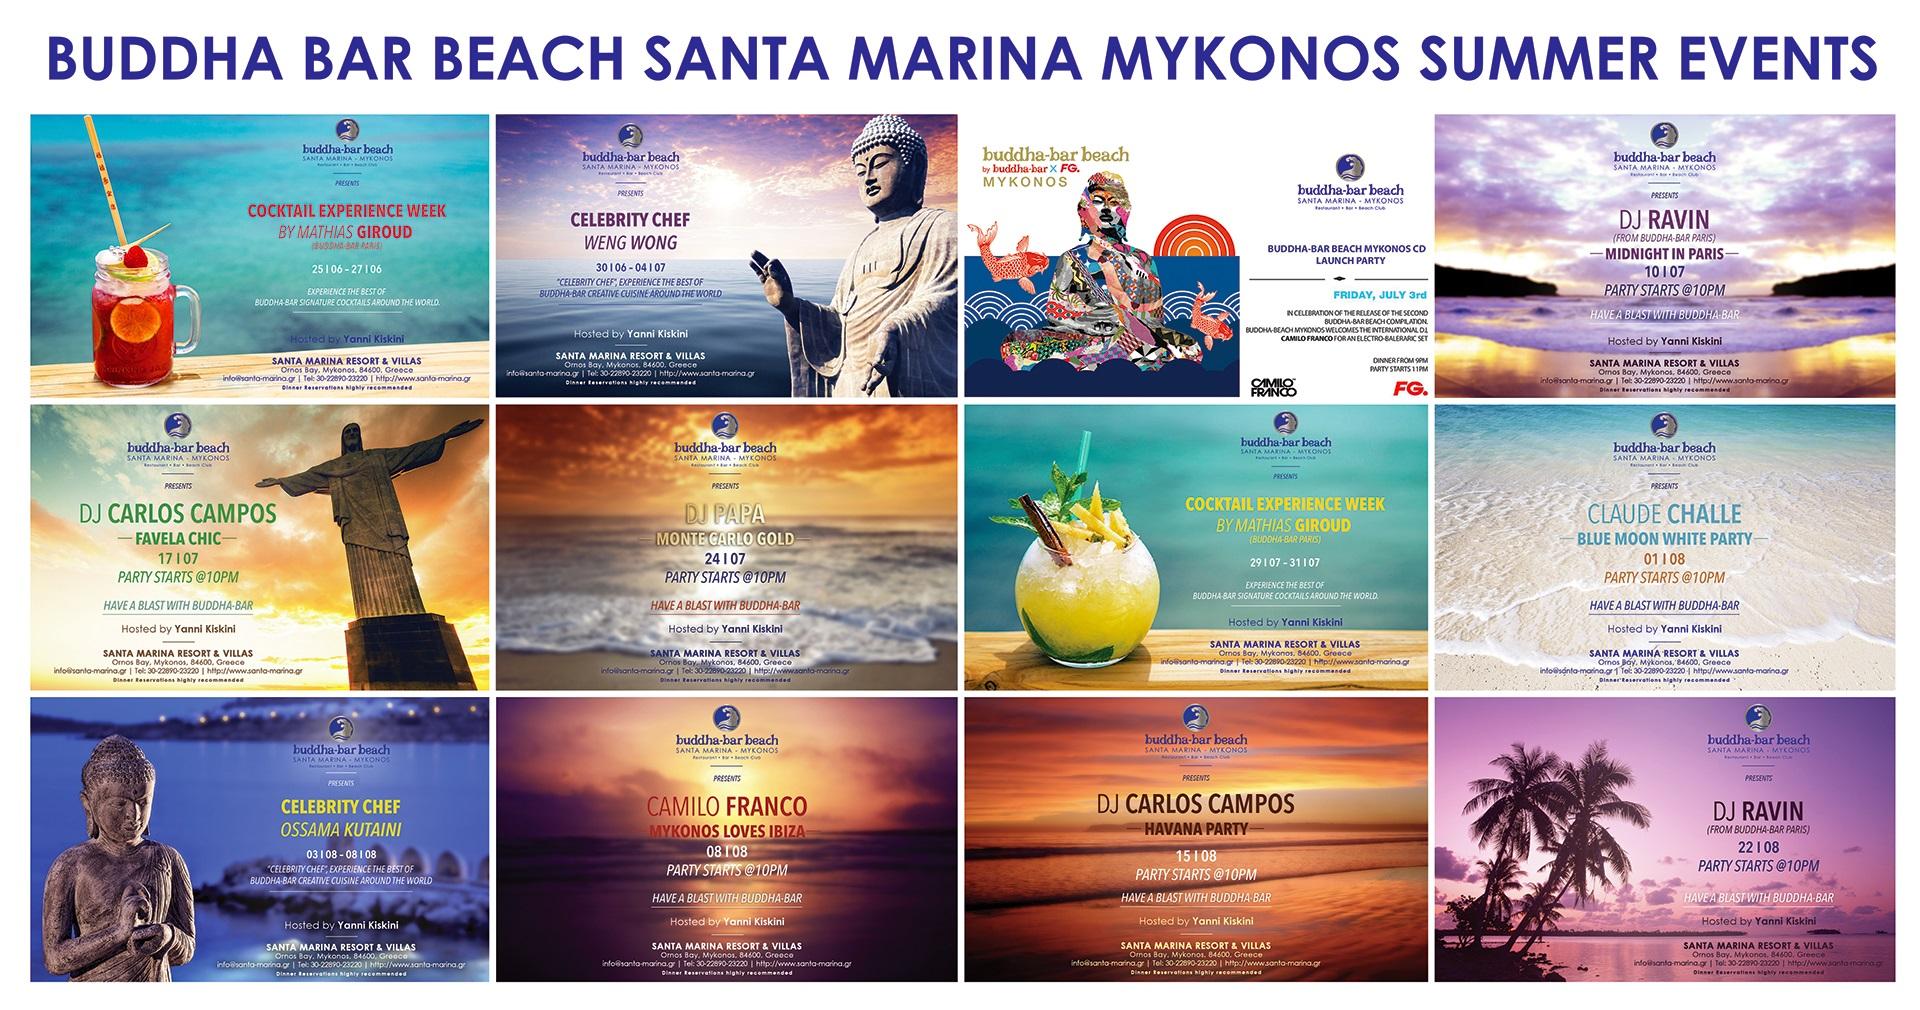 Buddha Bar, Mykonos Summer Events 2015!